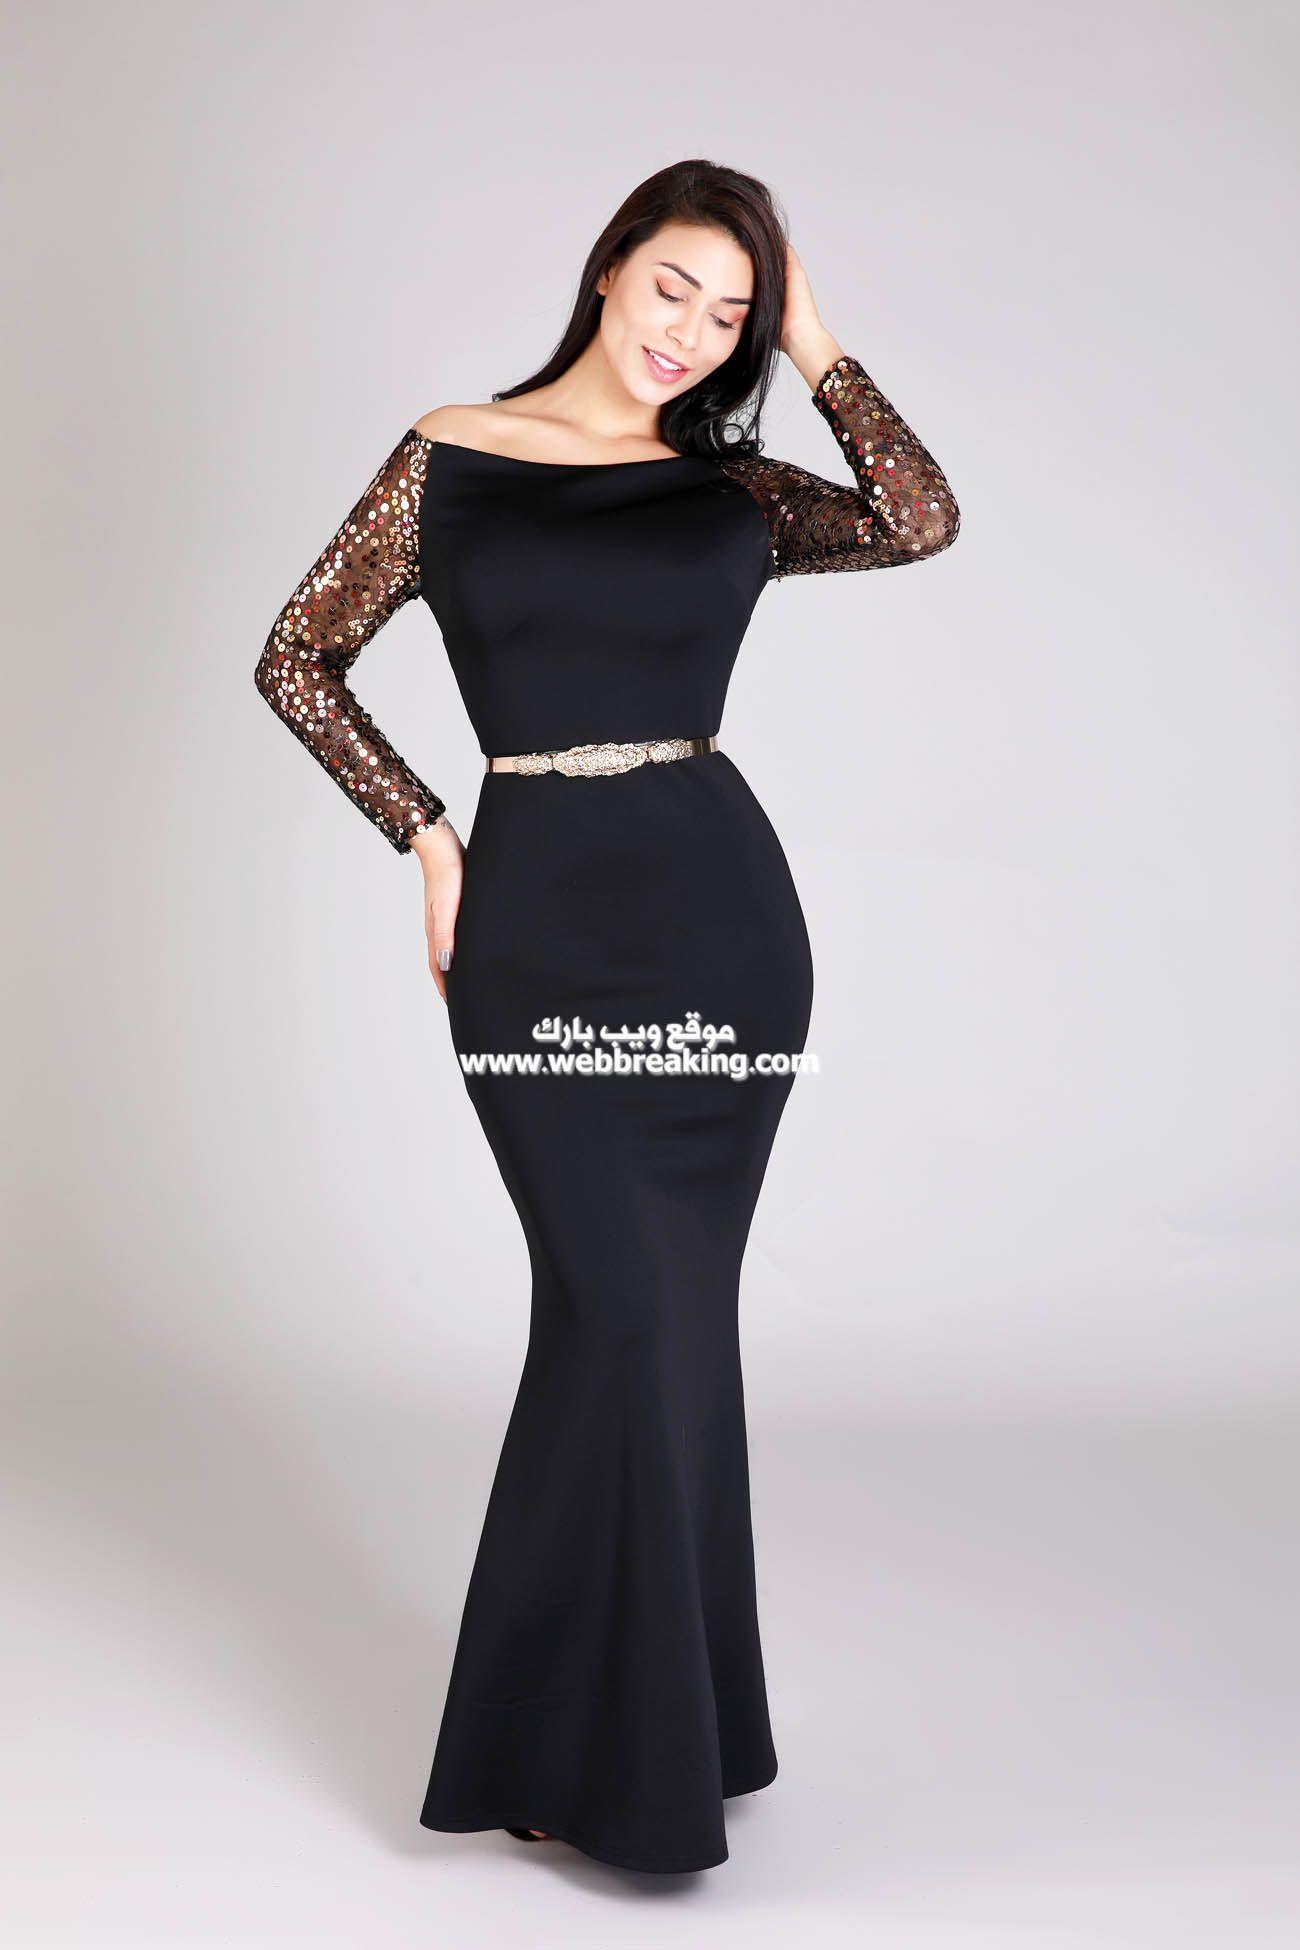 صور فساتين سهرة 2021 جديدة أجمل صور فساتين سهرة لون أسود 2021 فساتين للسهرة لون أسود أنيقة 2021 أجمل صور Mermaid Formal Dress Formal Dresses Long Dresses